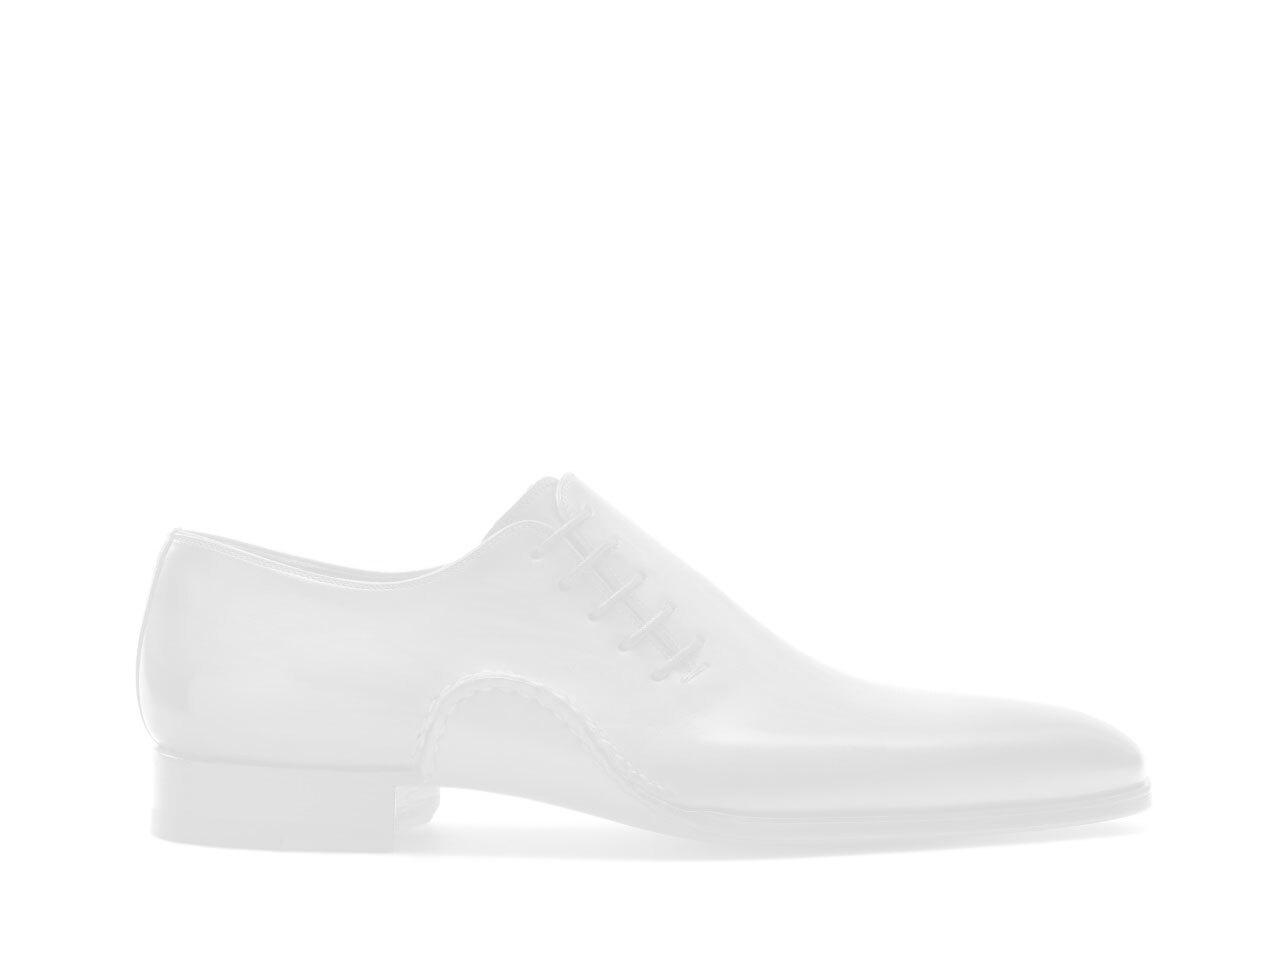 Pair of the Magnanni Marbella Cuero Men's Loafers